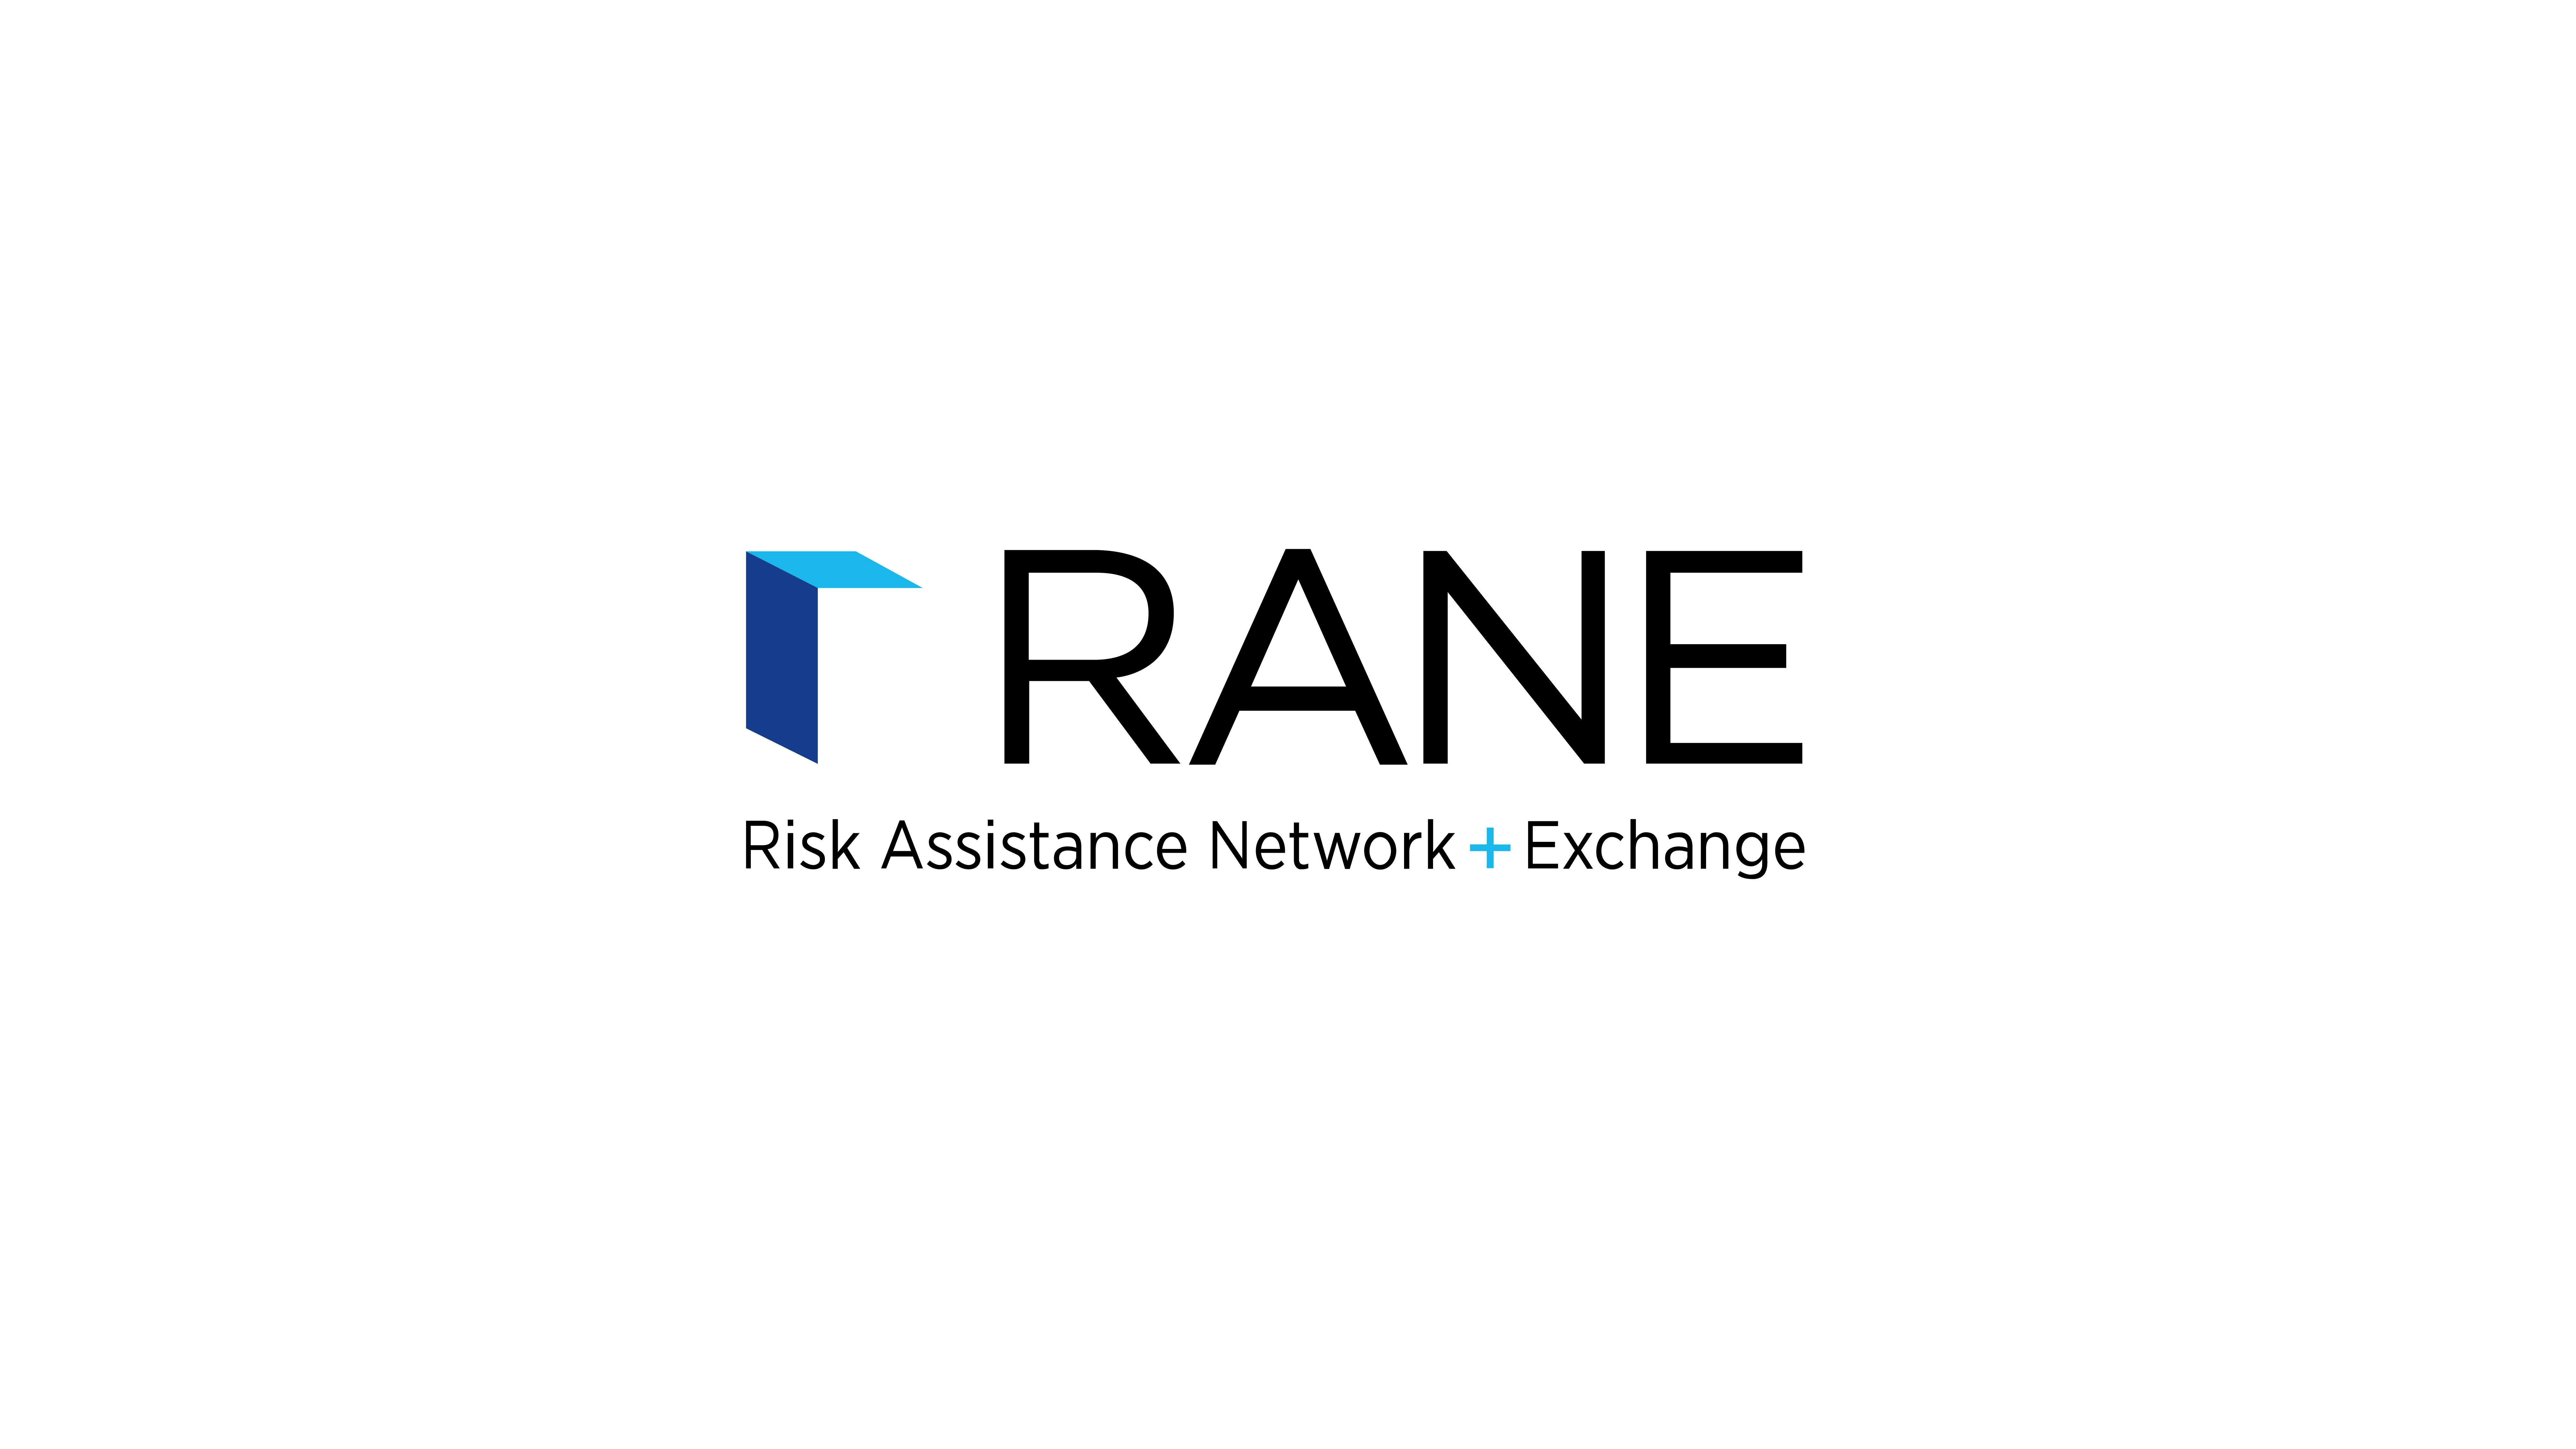 RANE: Risk Assistance Network + Exchange